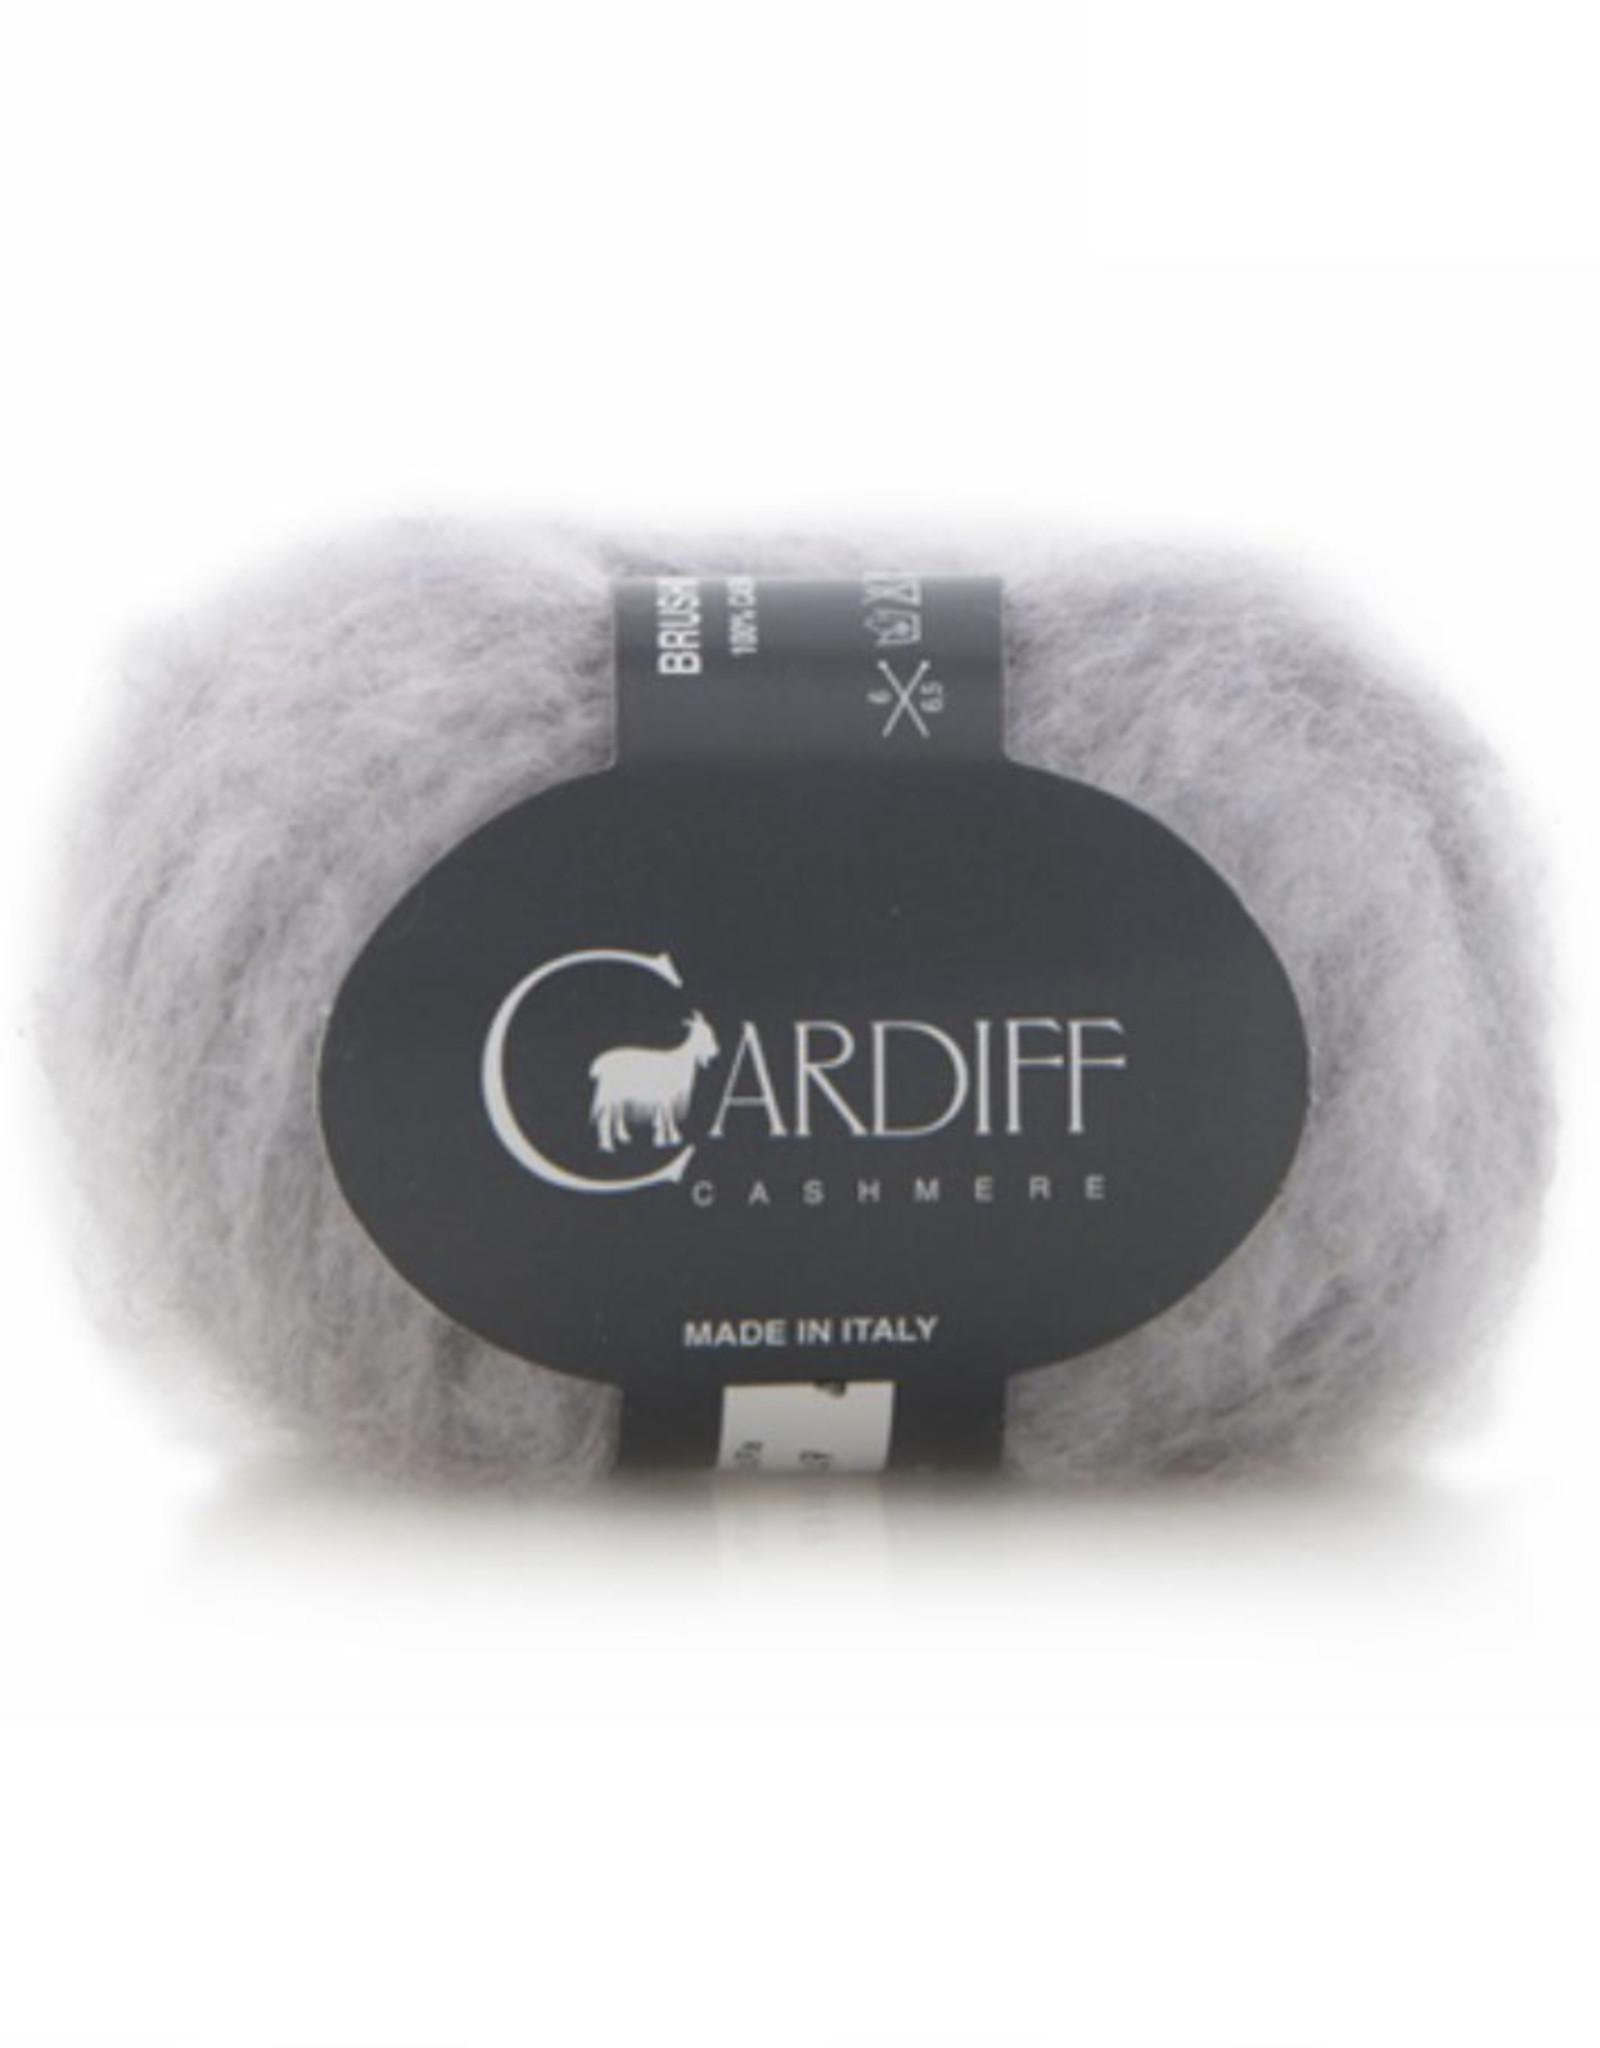 Cardiff Brushmere